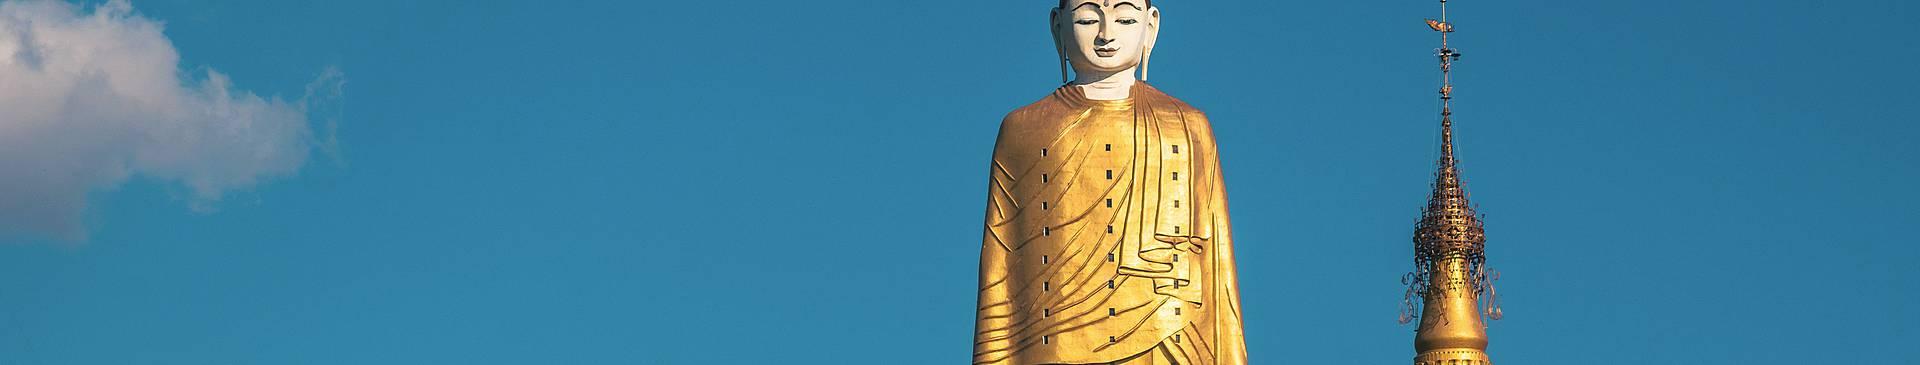 Historical sites in Burma